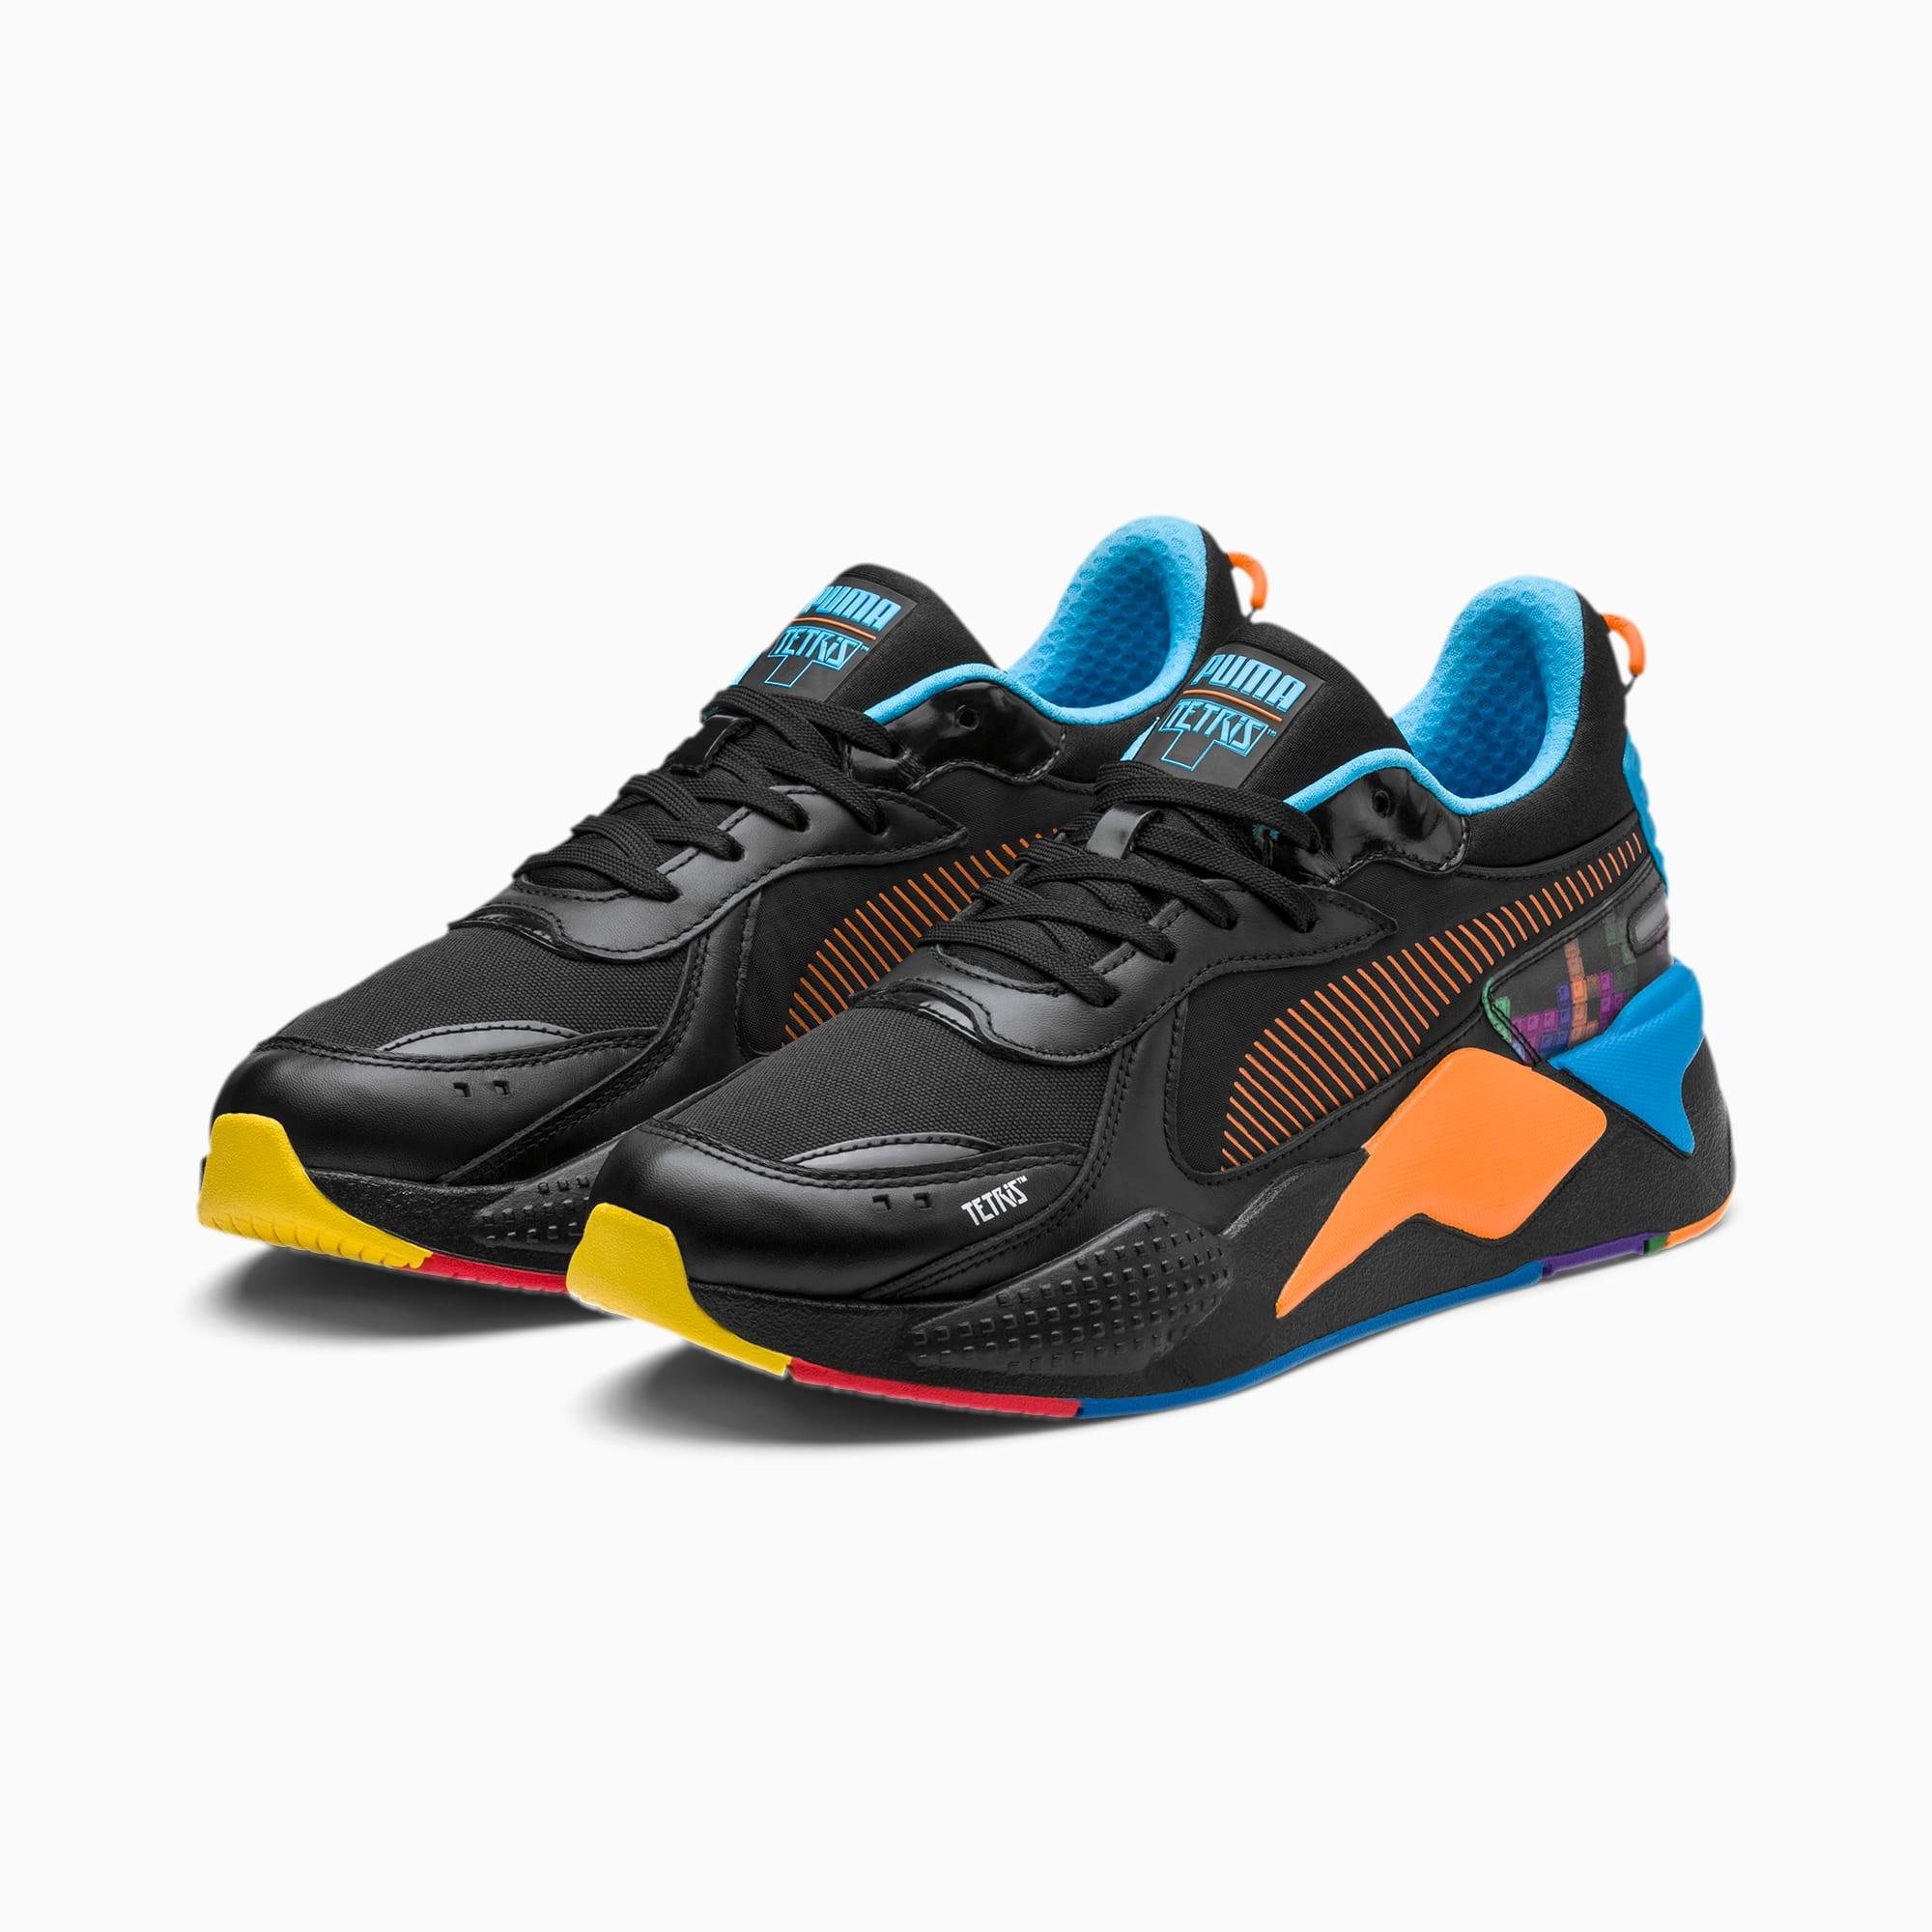 Dettagli su Puma Rs X x Tetris Corsa Uomo Sneakers Scarpe Uomo Scarpe